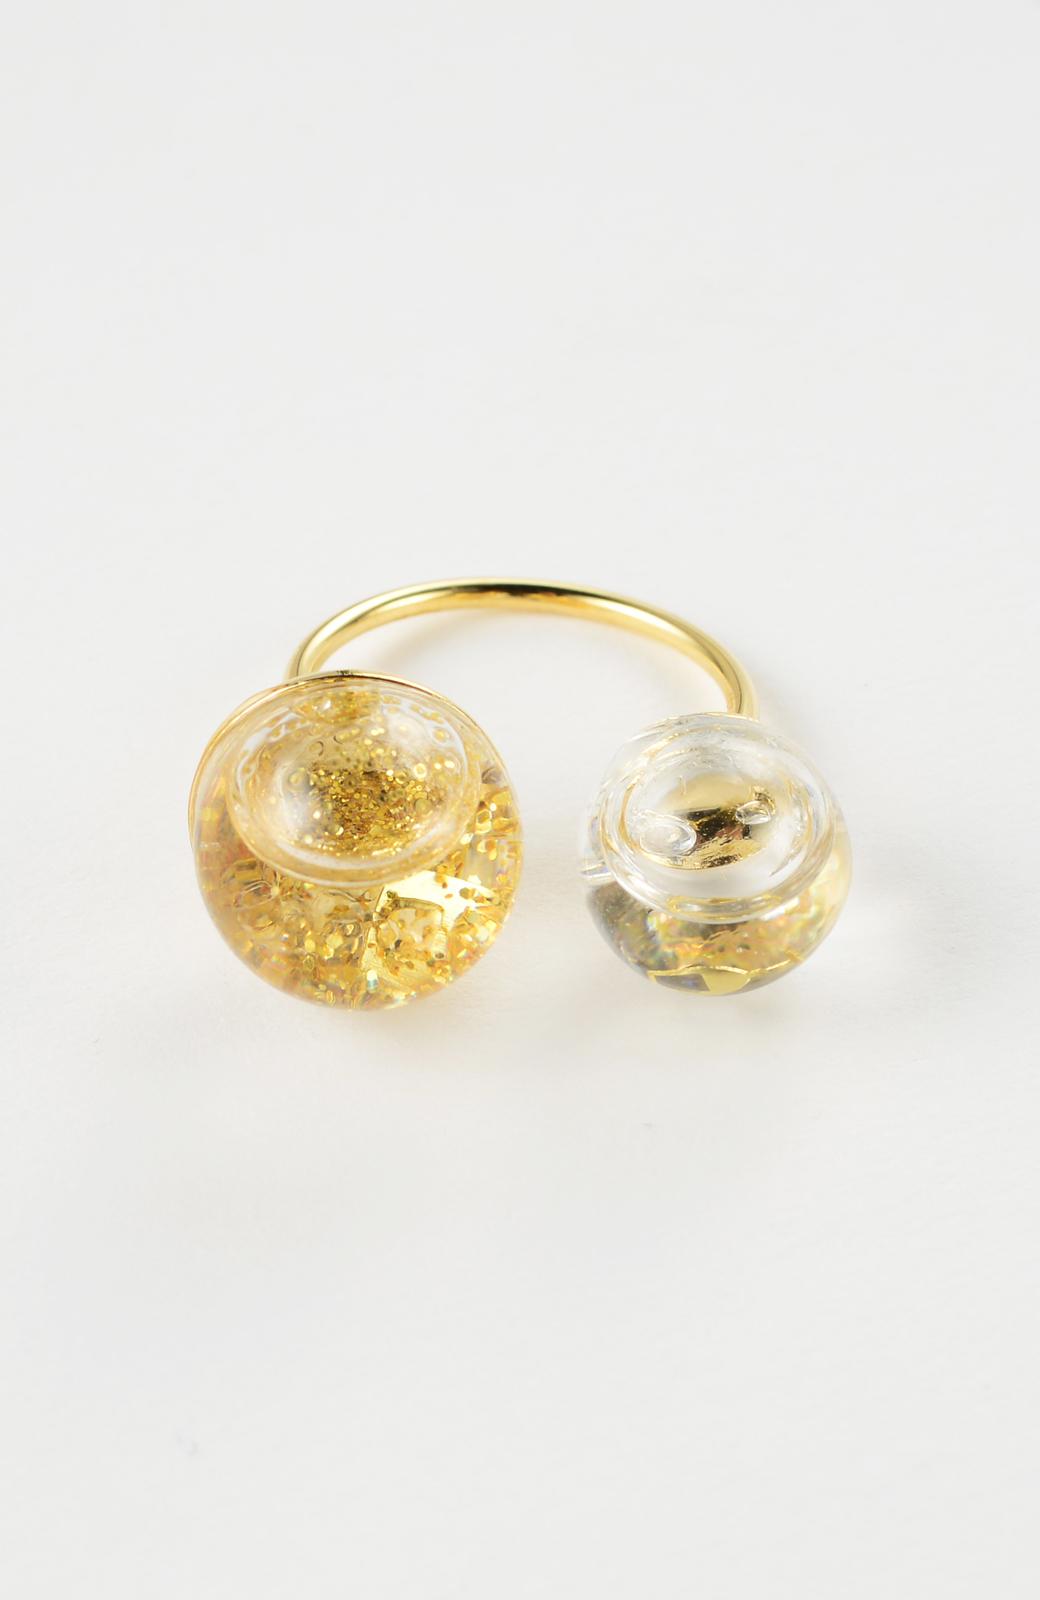 haco! てとひとて KANA MATSUNAMI チャリティー企画 W Glass dome リング <ゴールド>の商品写真4